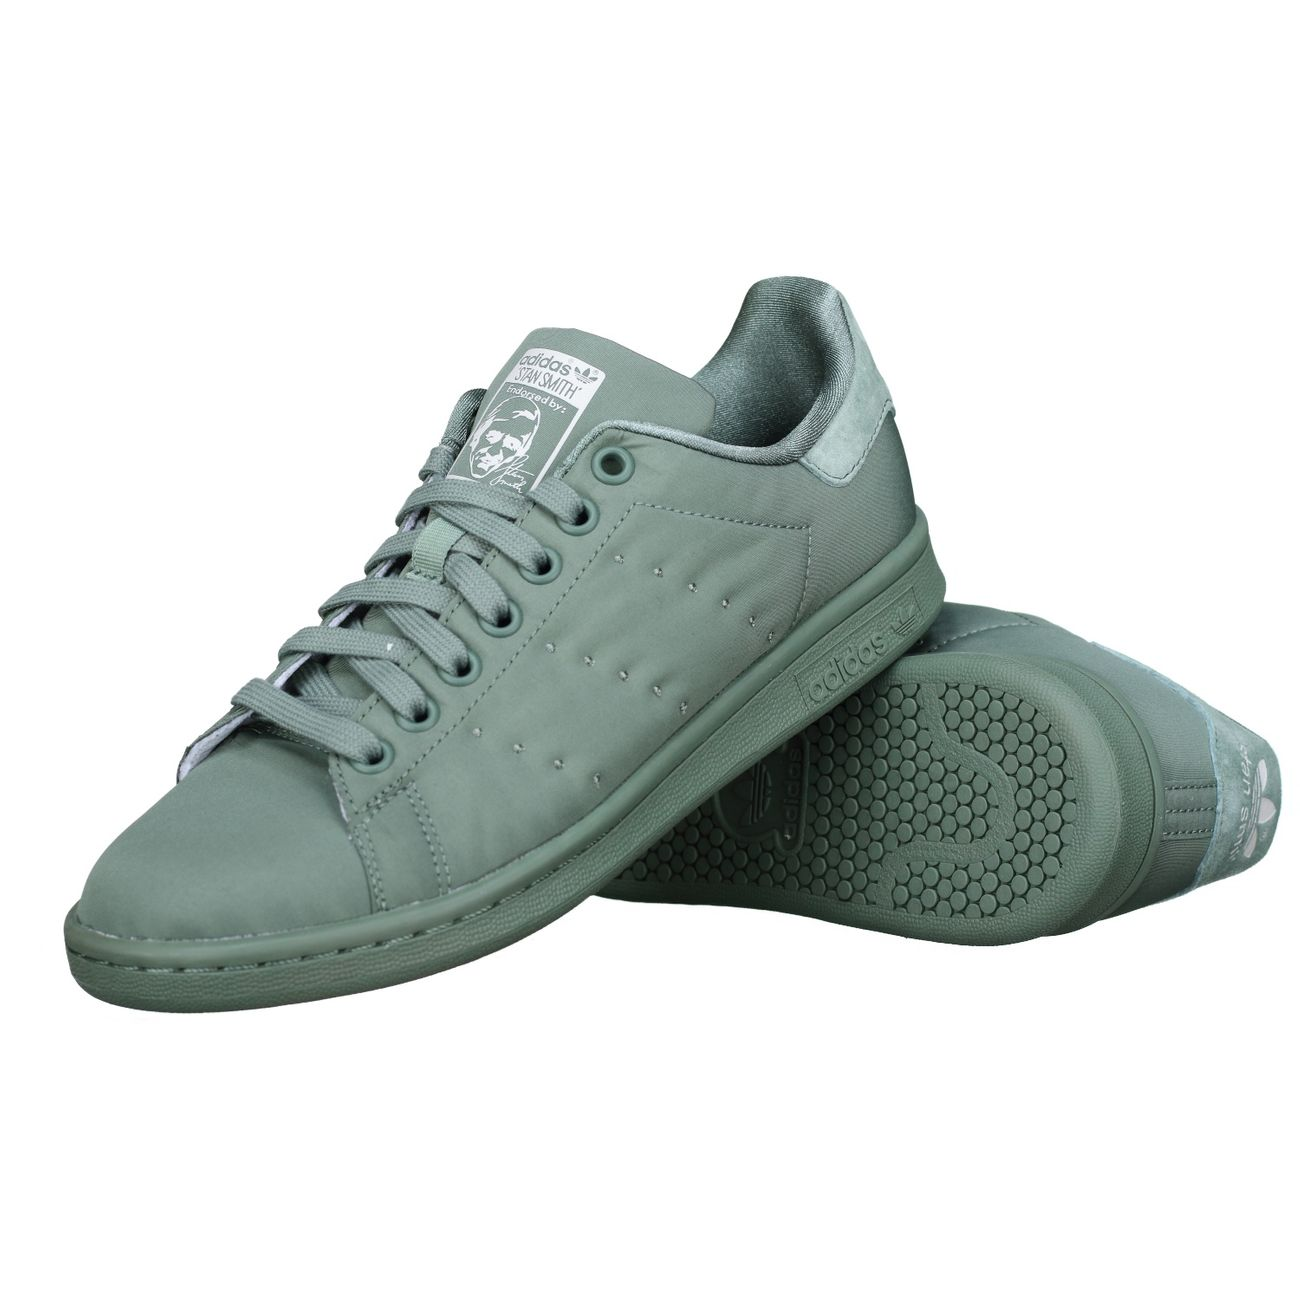 Mode- Lifestyle homme ADIDAS Basket Adidas Stan Smith W Bz0396 Vert